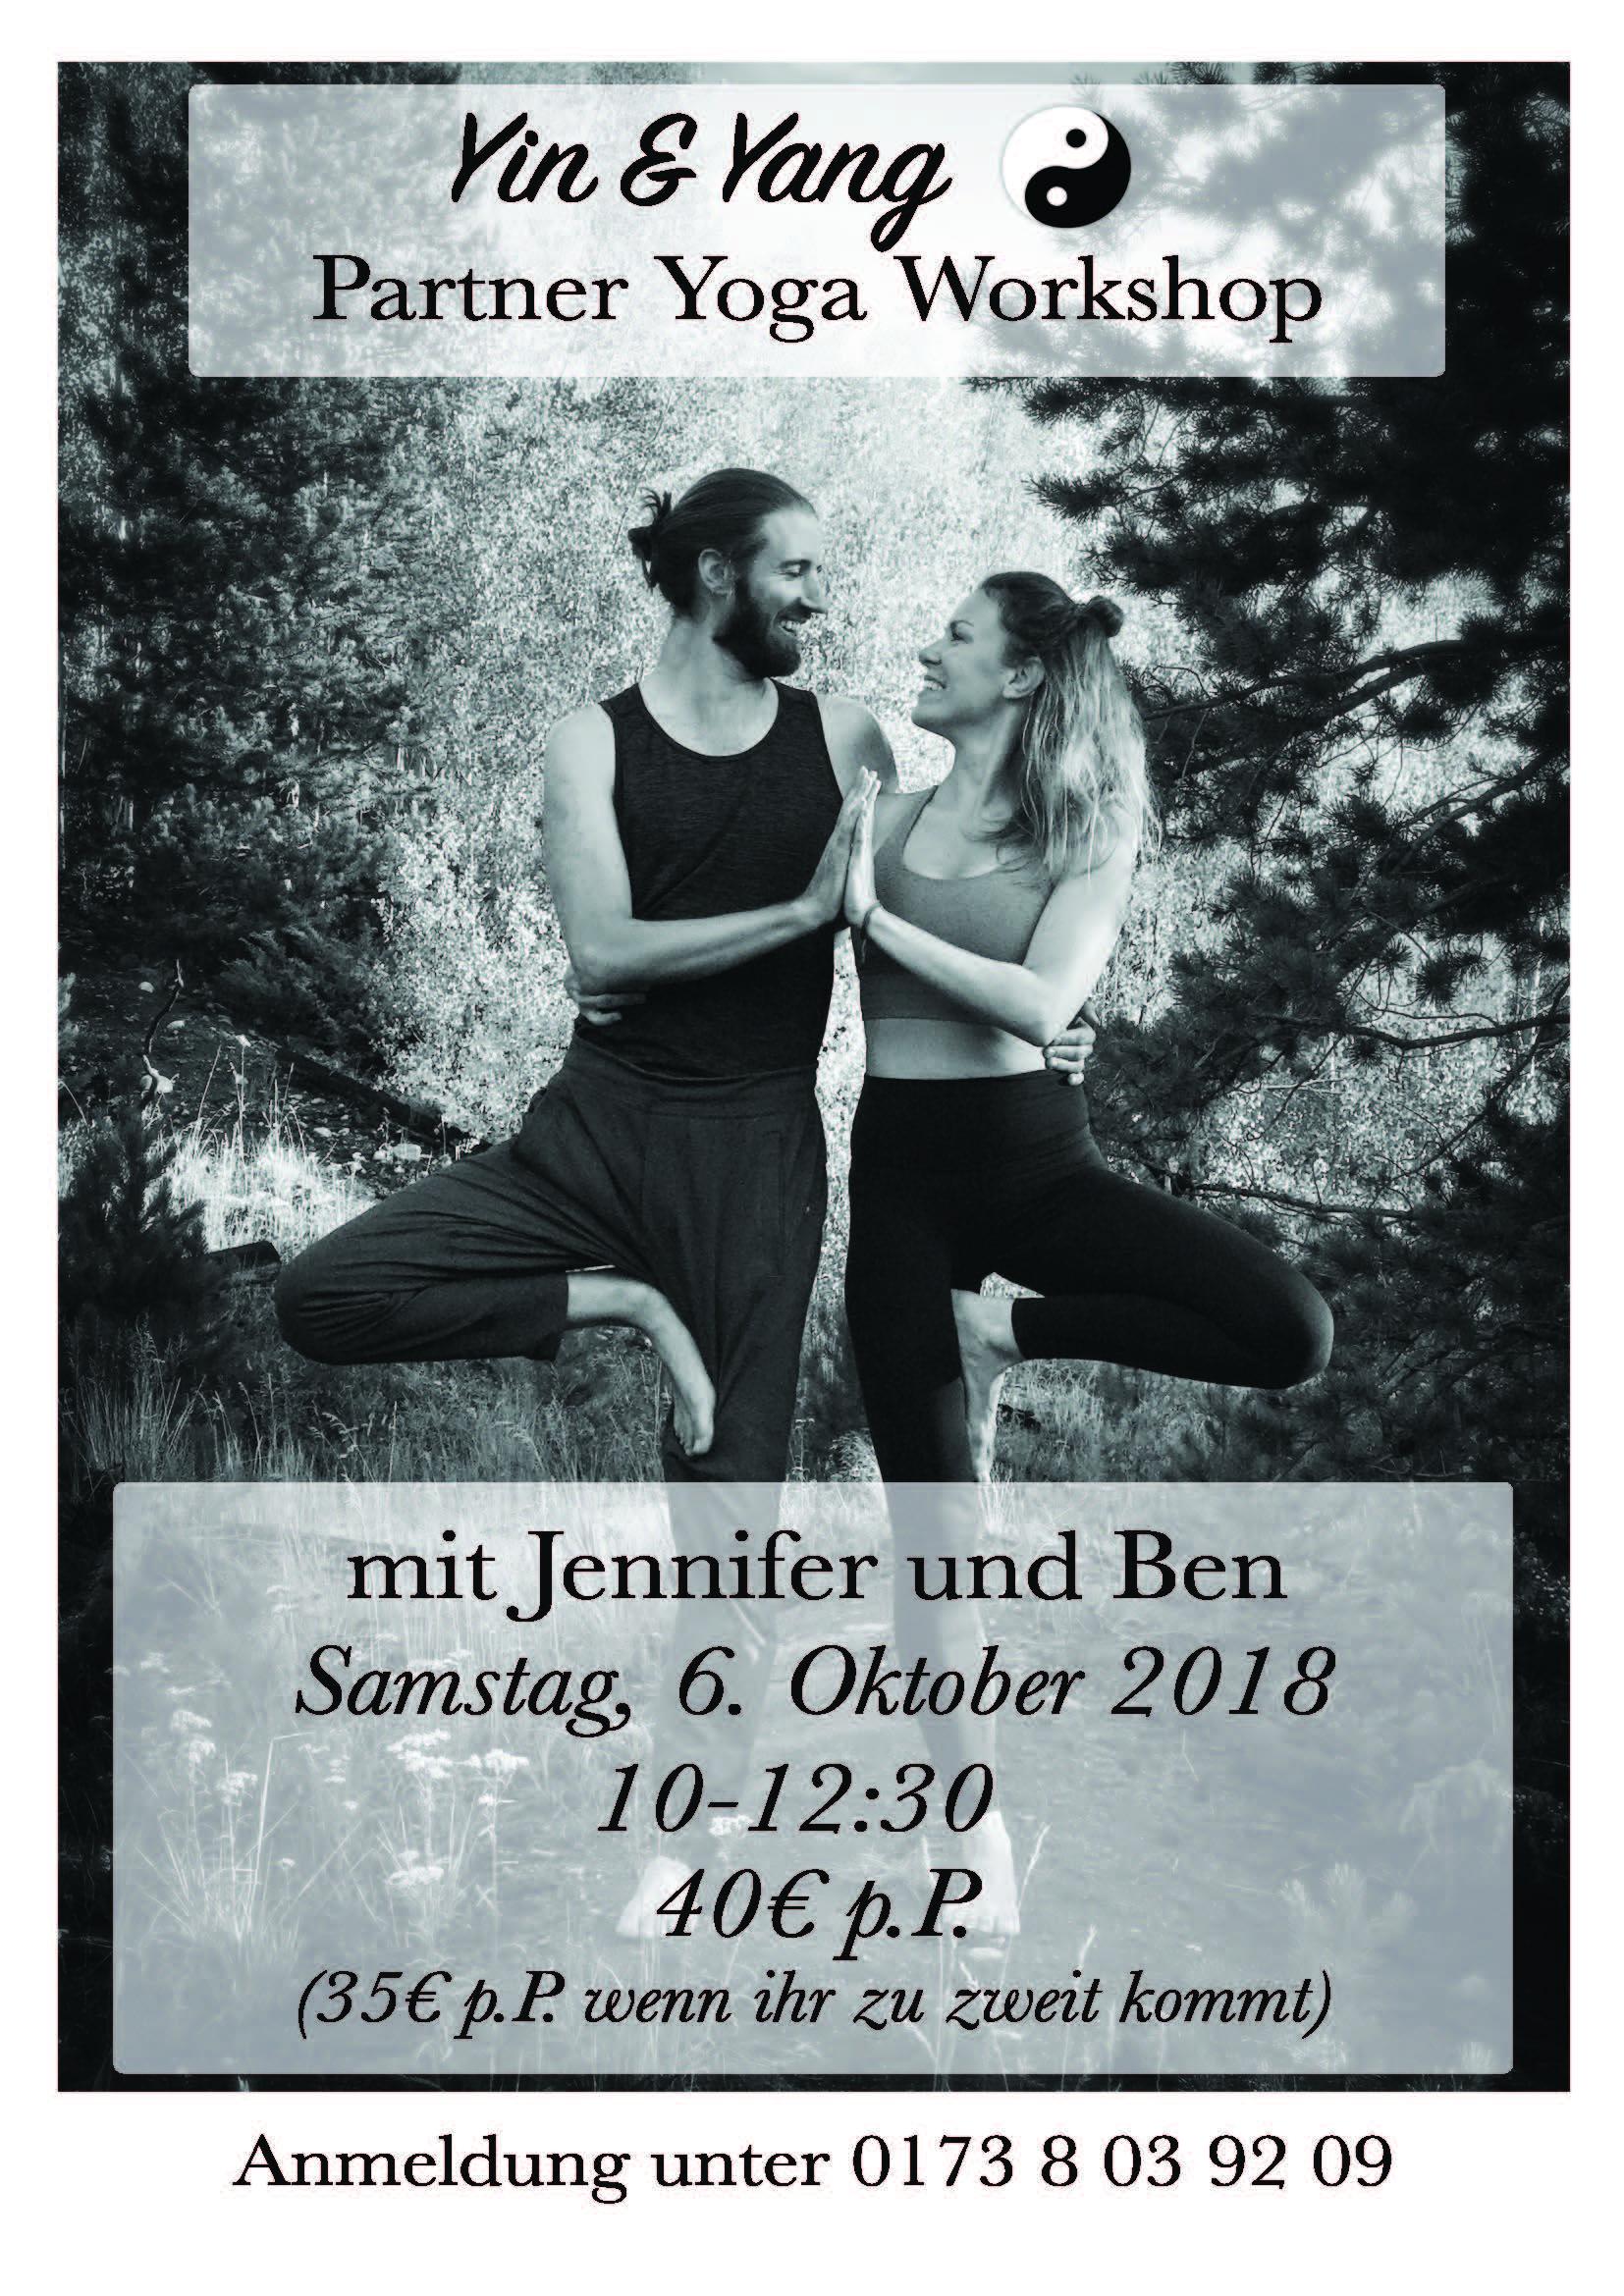 Yin Yang Partner Yoga Workshop